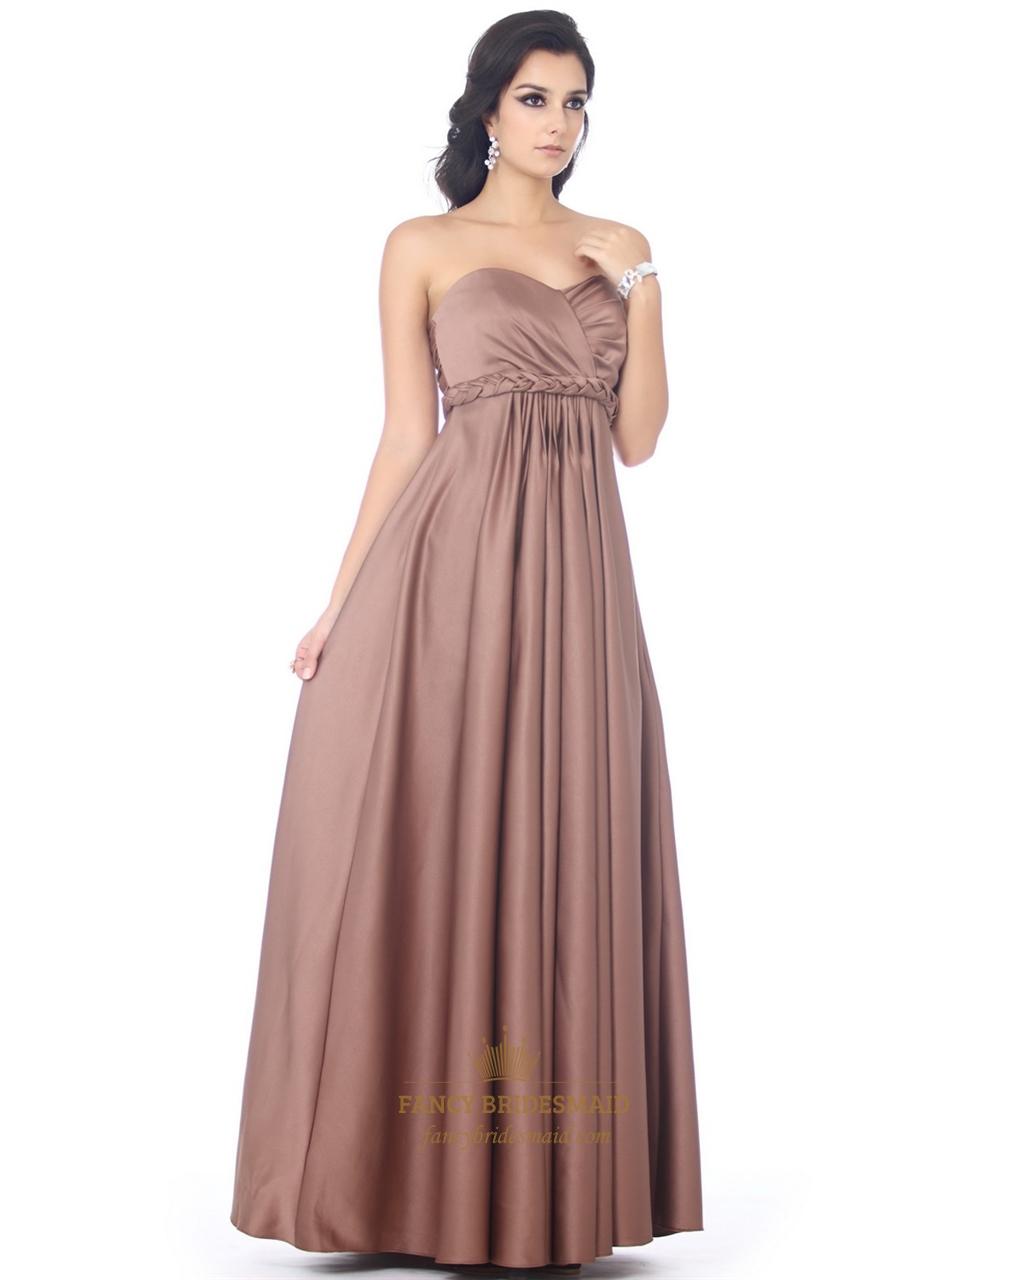 Chocolate Brown Satin Sweetheart Bridesmaid Dress With